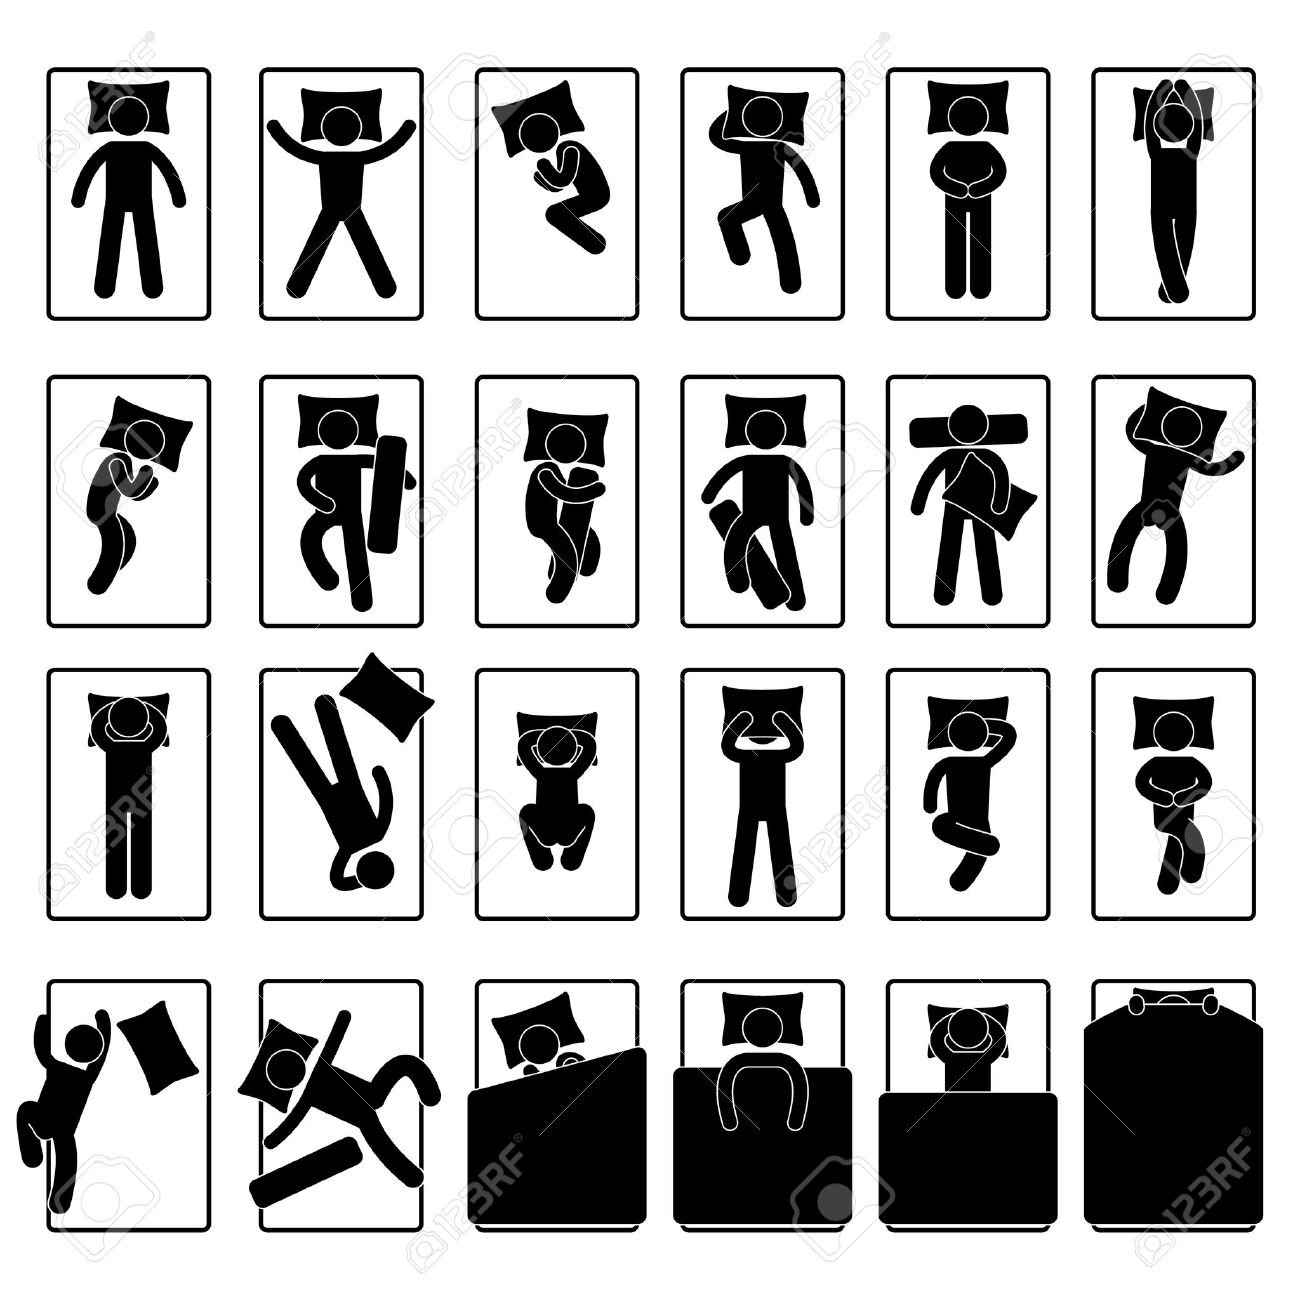 Sleep Sleeping Position Style Posture Method Bed - 12483516